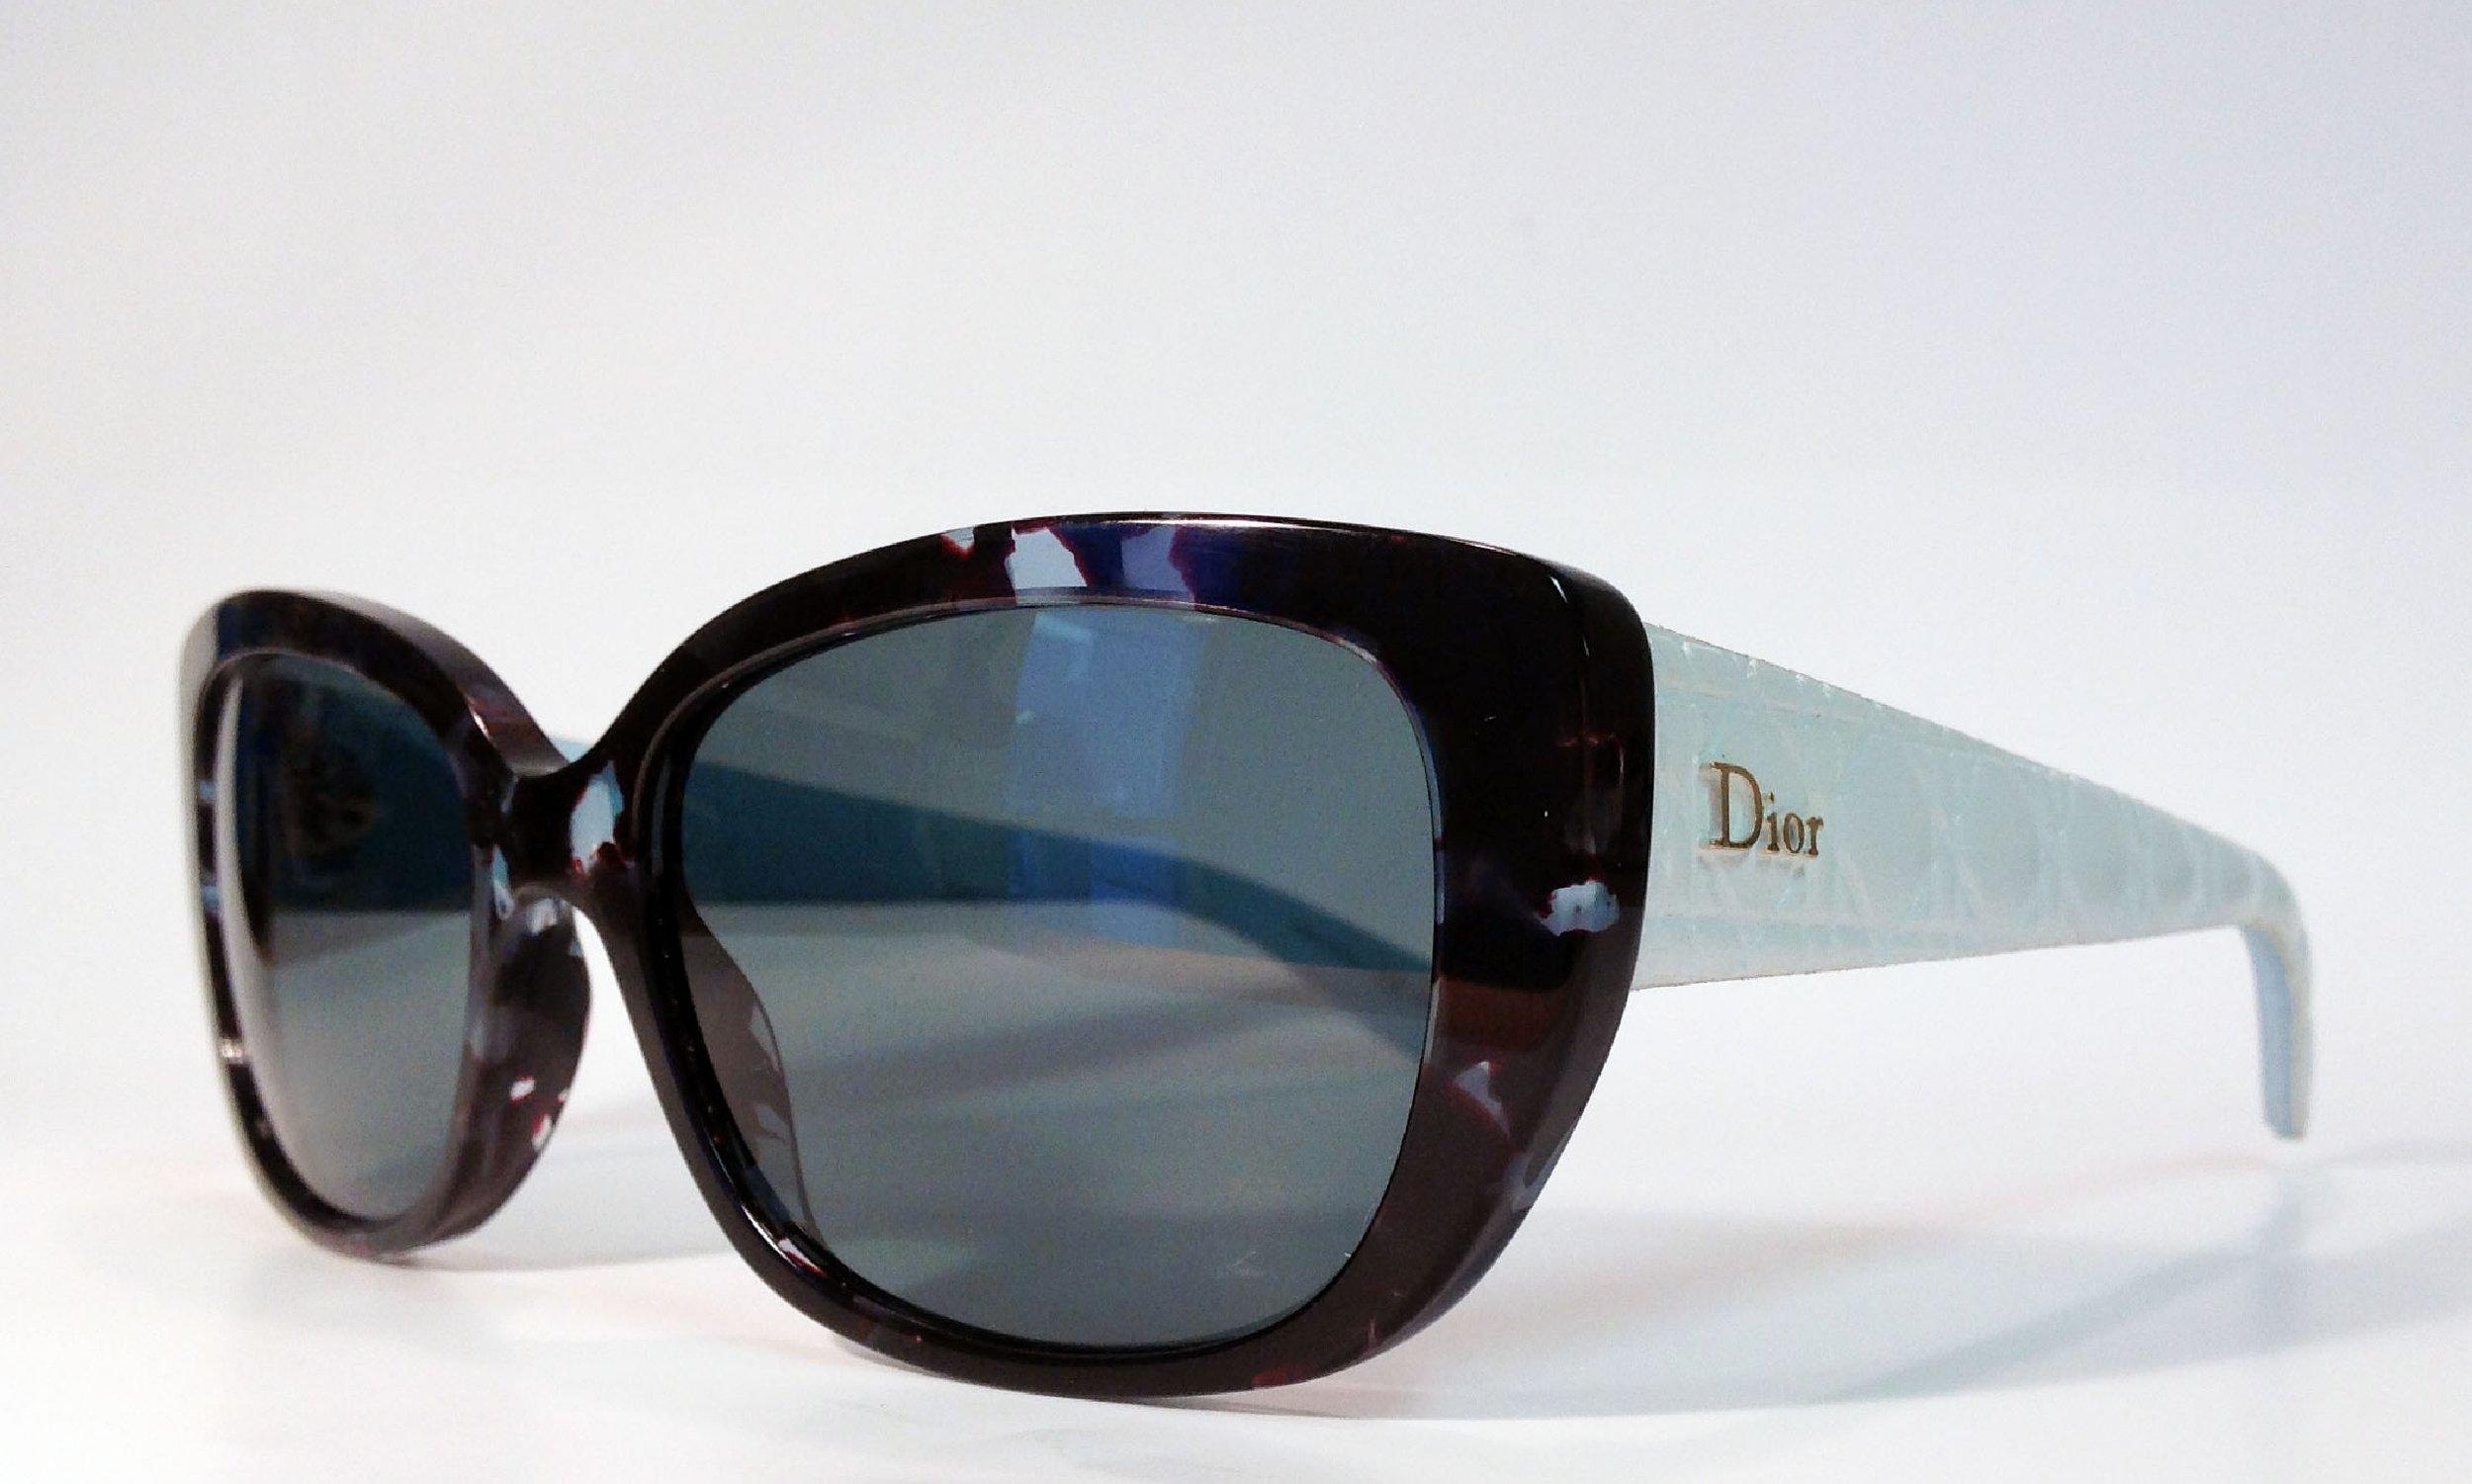 Dior €320